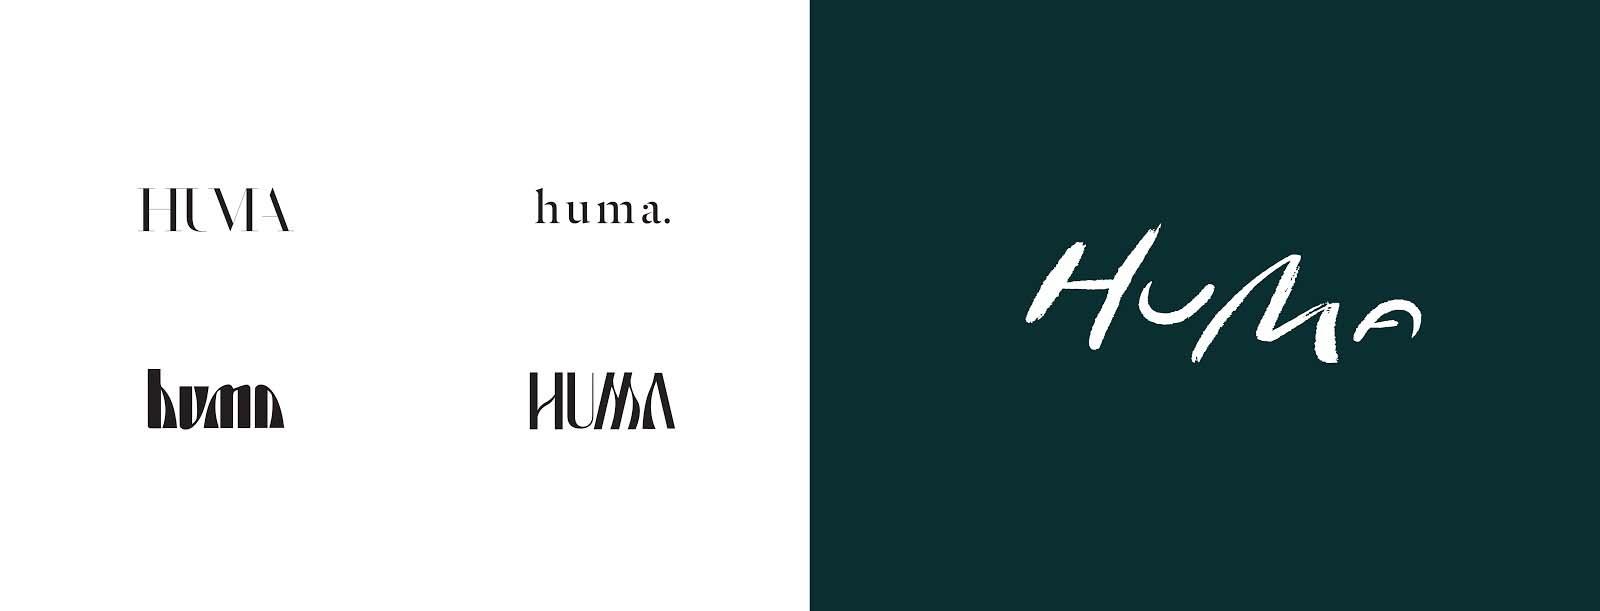 TBC Work - Huma - 5